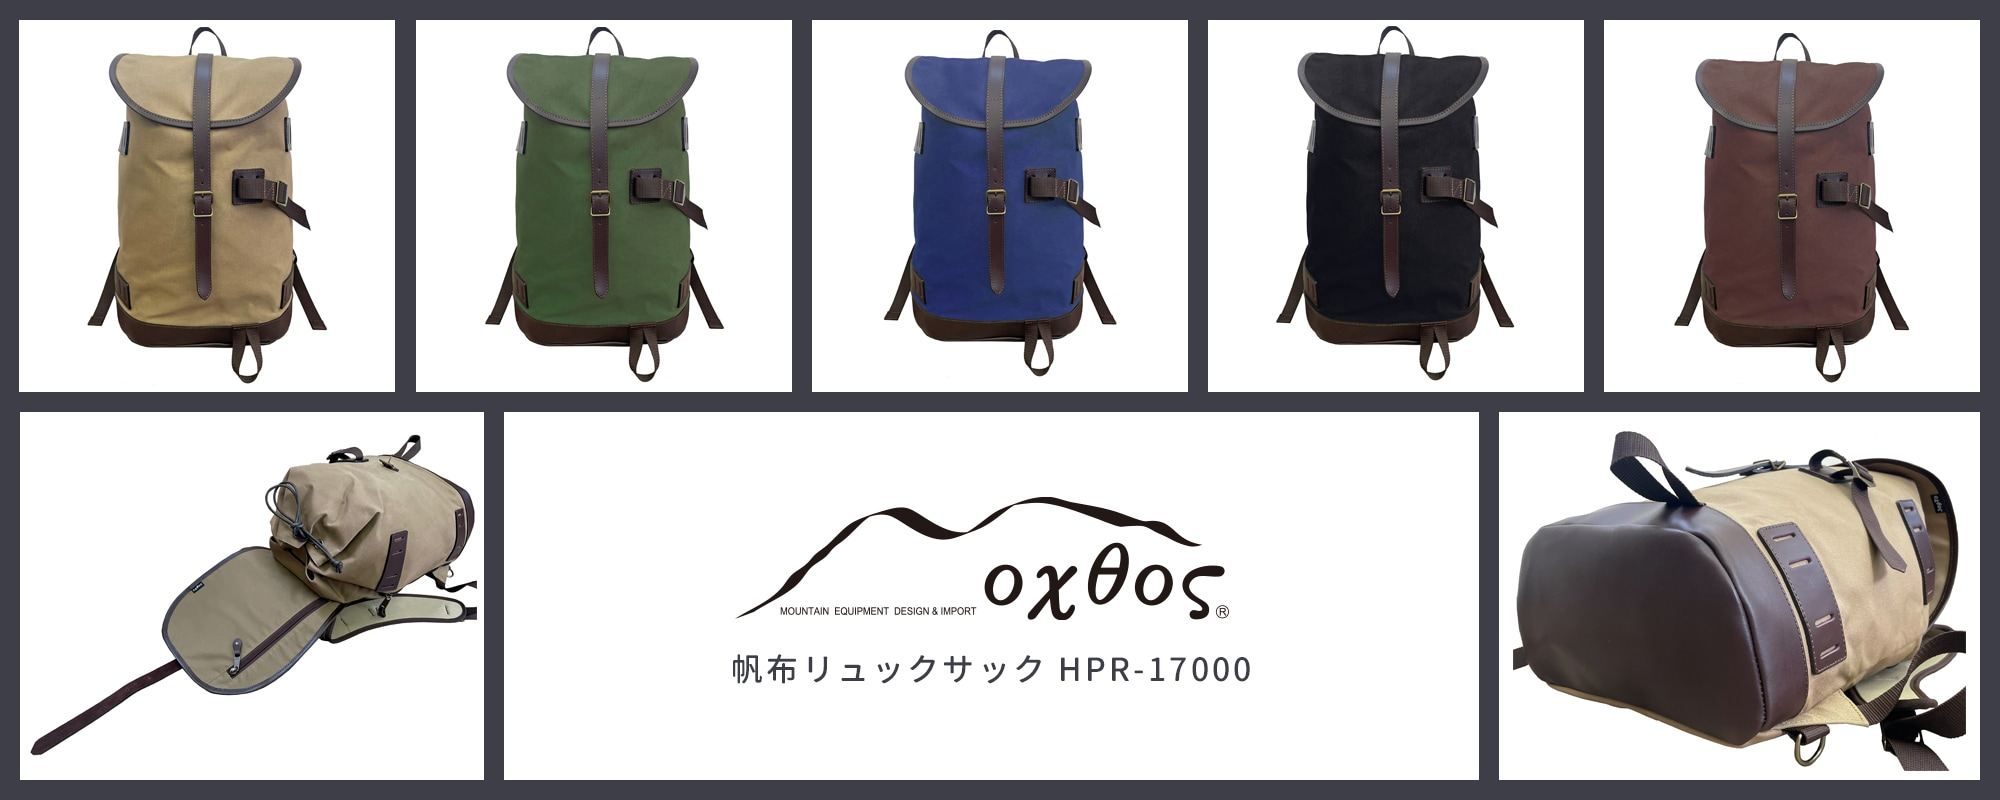 oxtos(オクトス) 帆布リュックサック HPR-17000